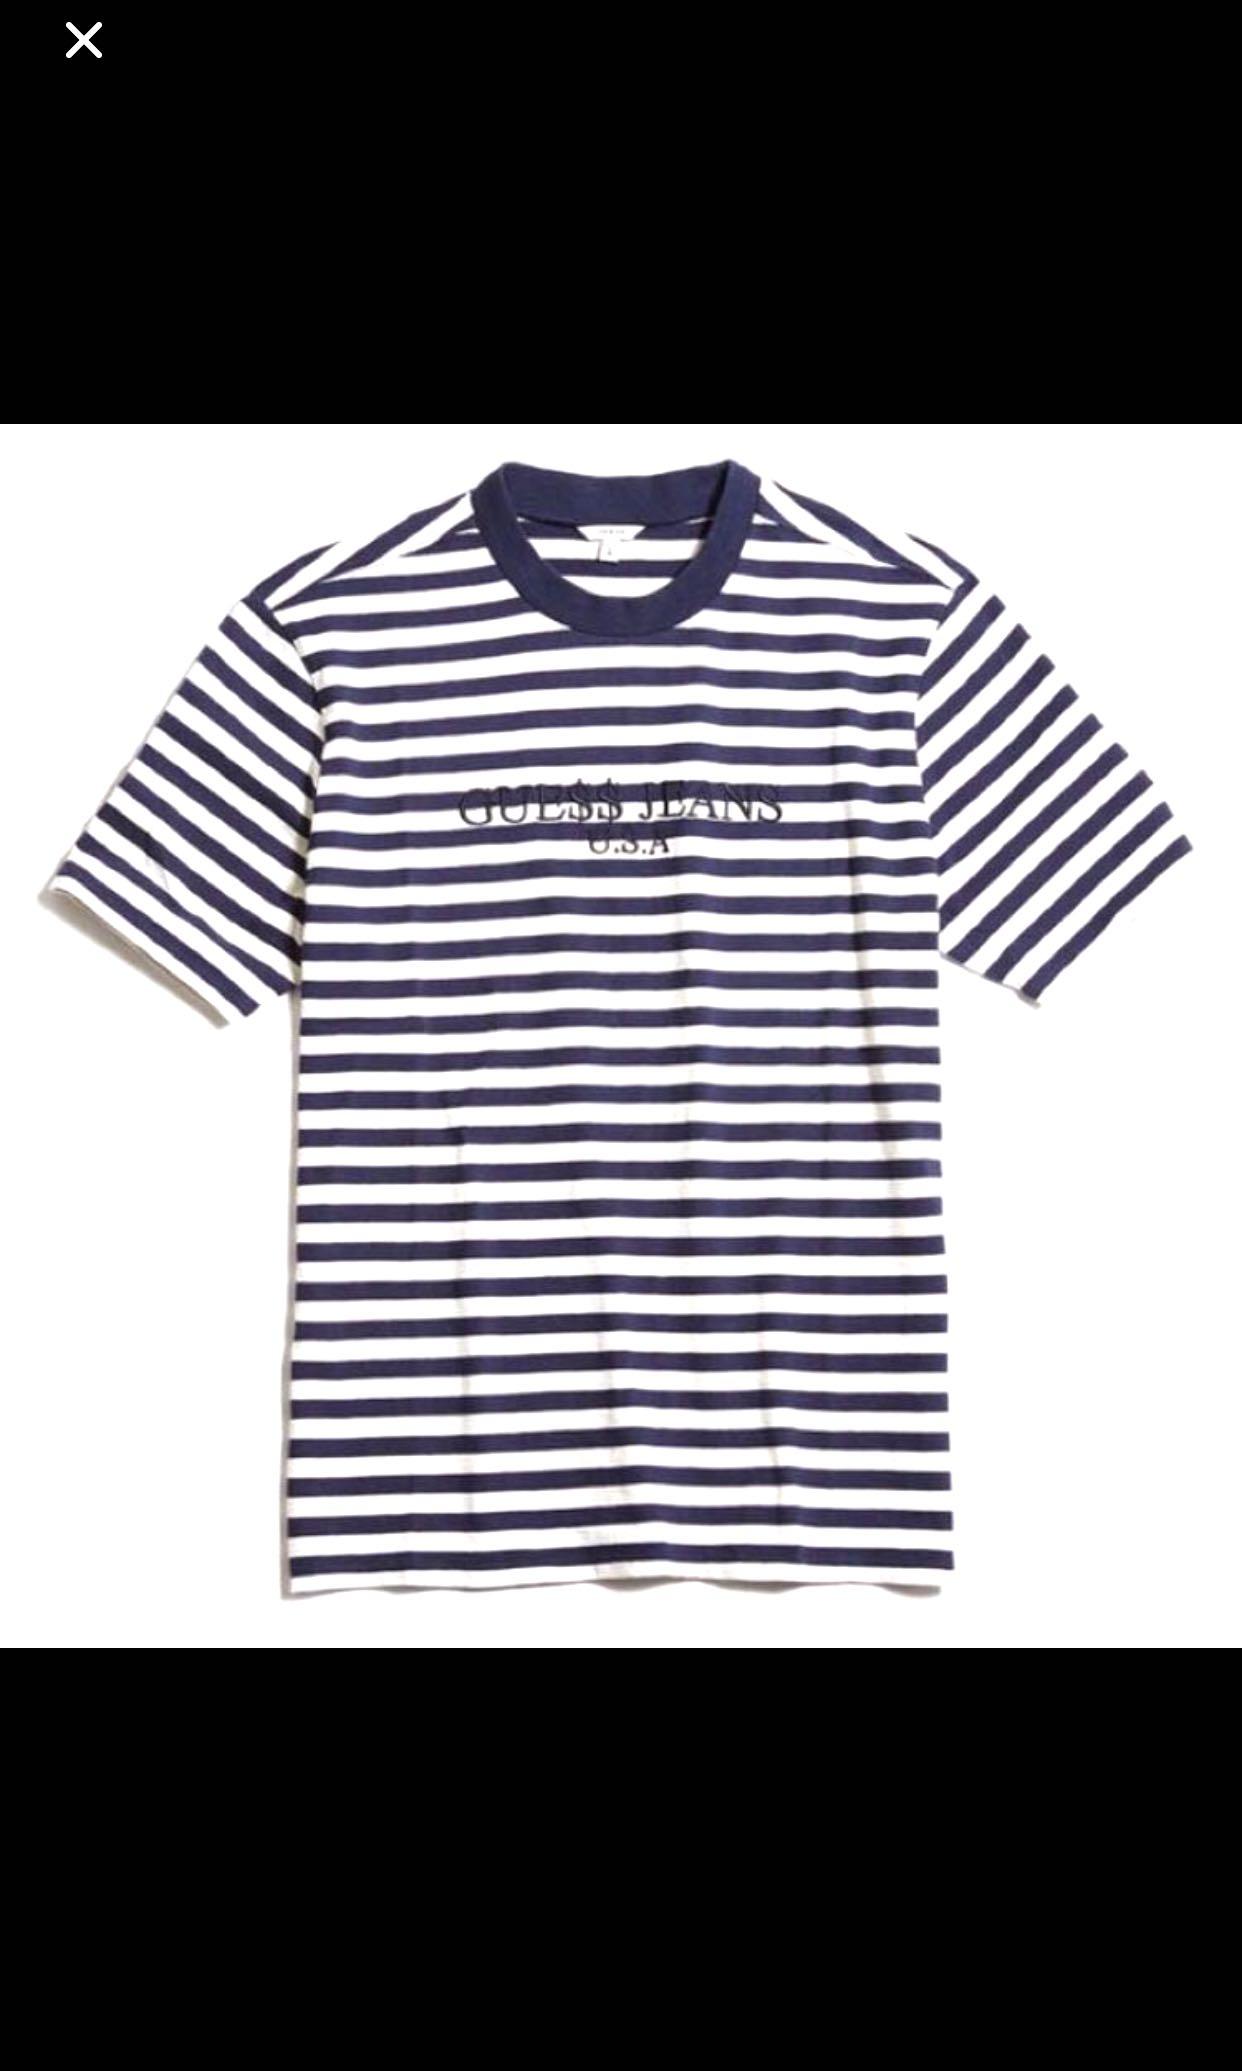 649be15543 GUESS X ASAP A$AP ROCKY STRIPE NAVY, Men's Fashion, Clothes, Tops on ...